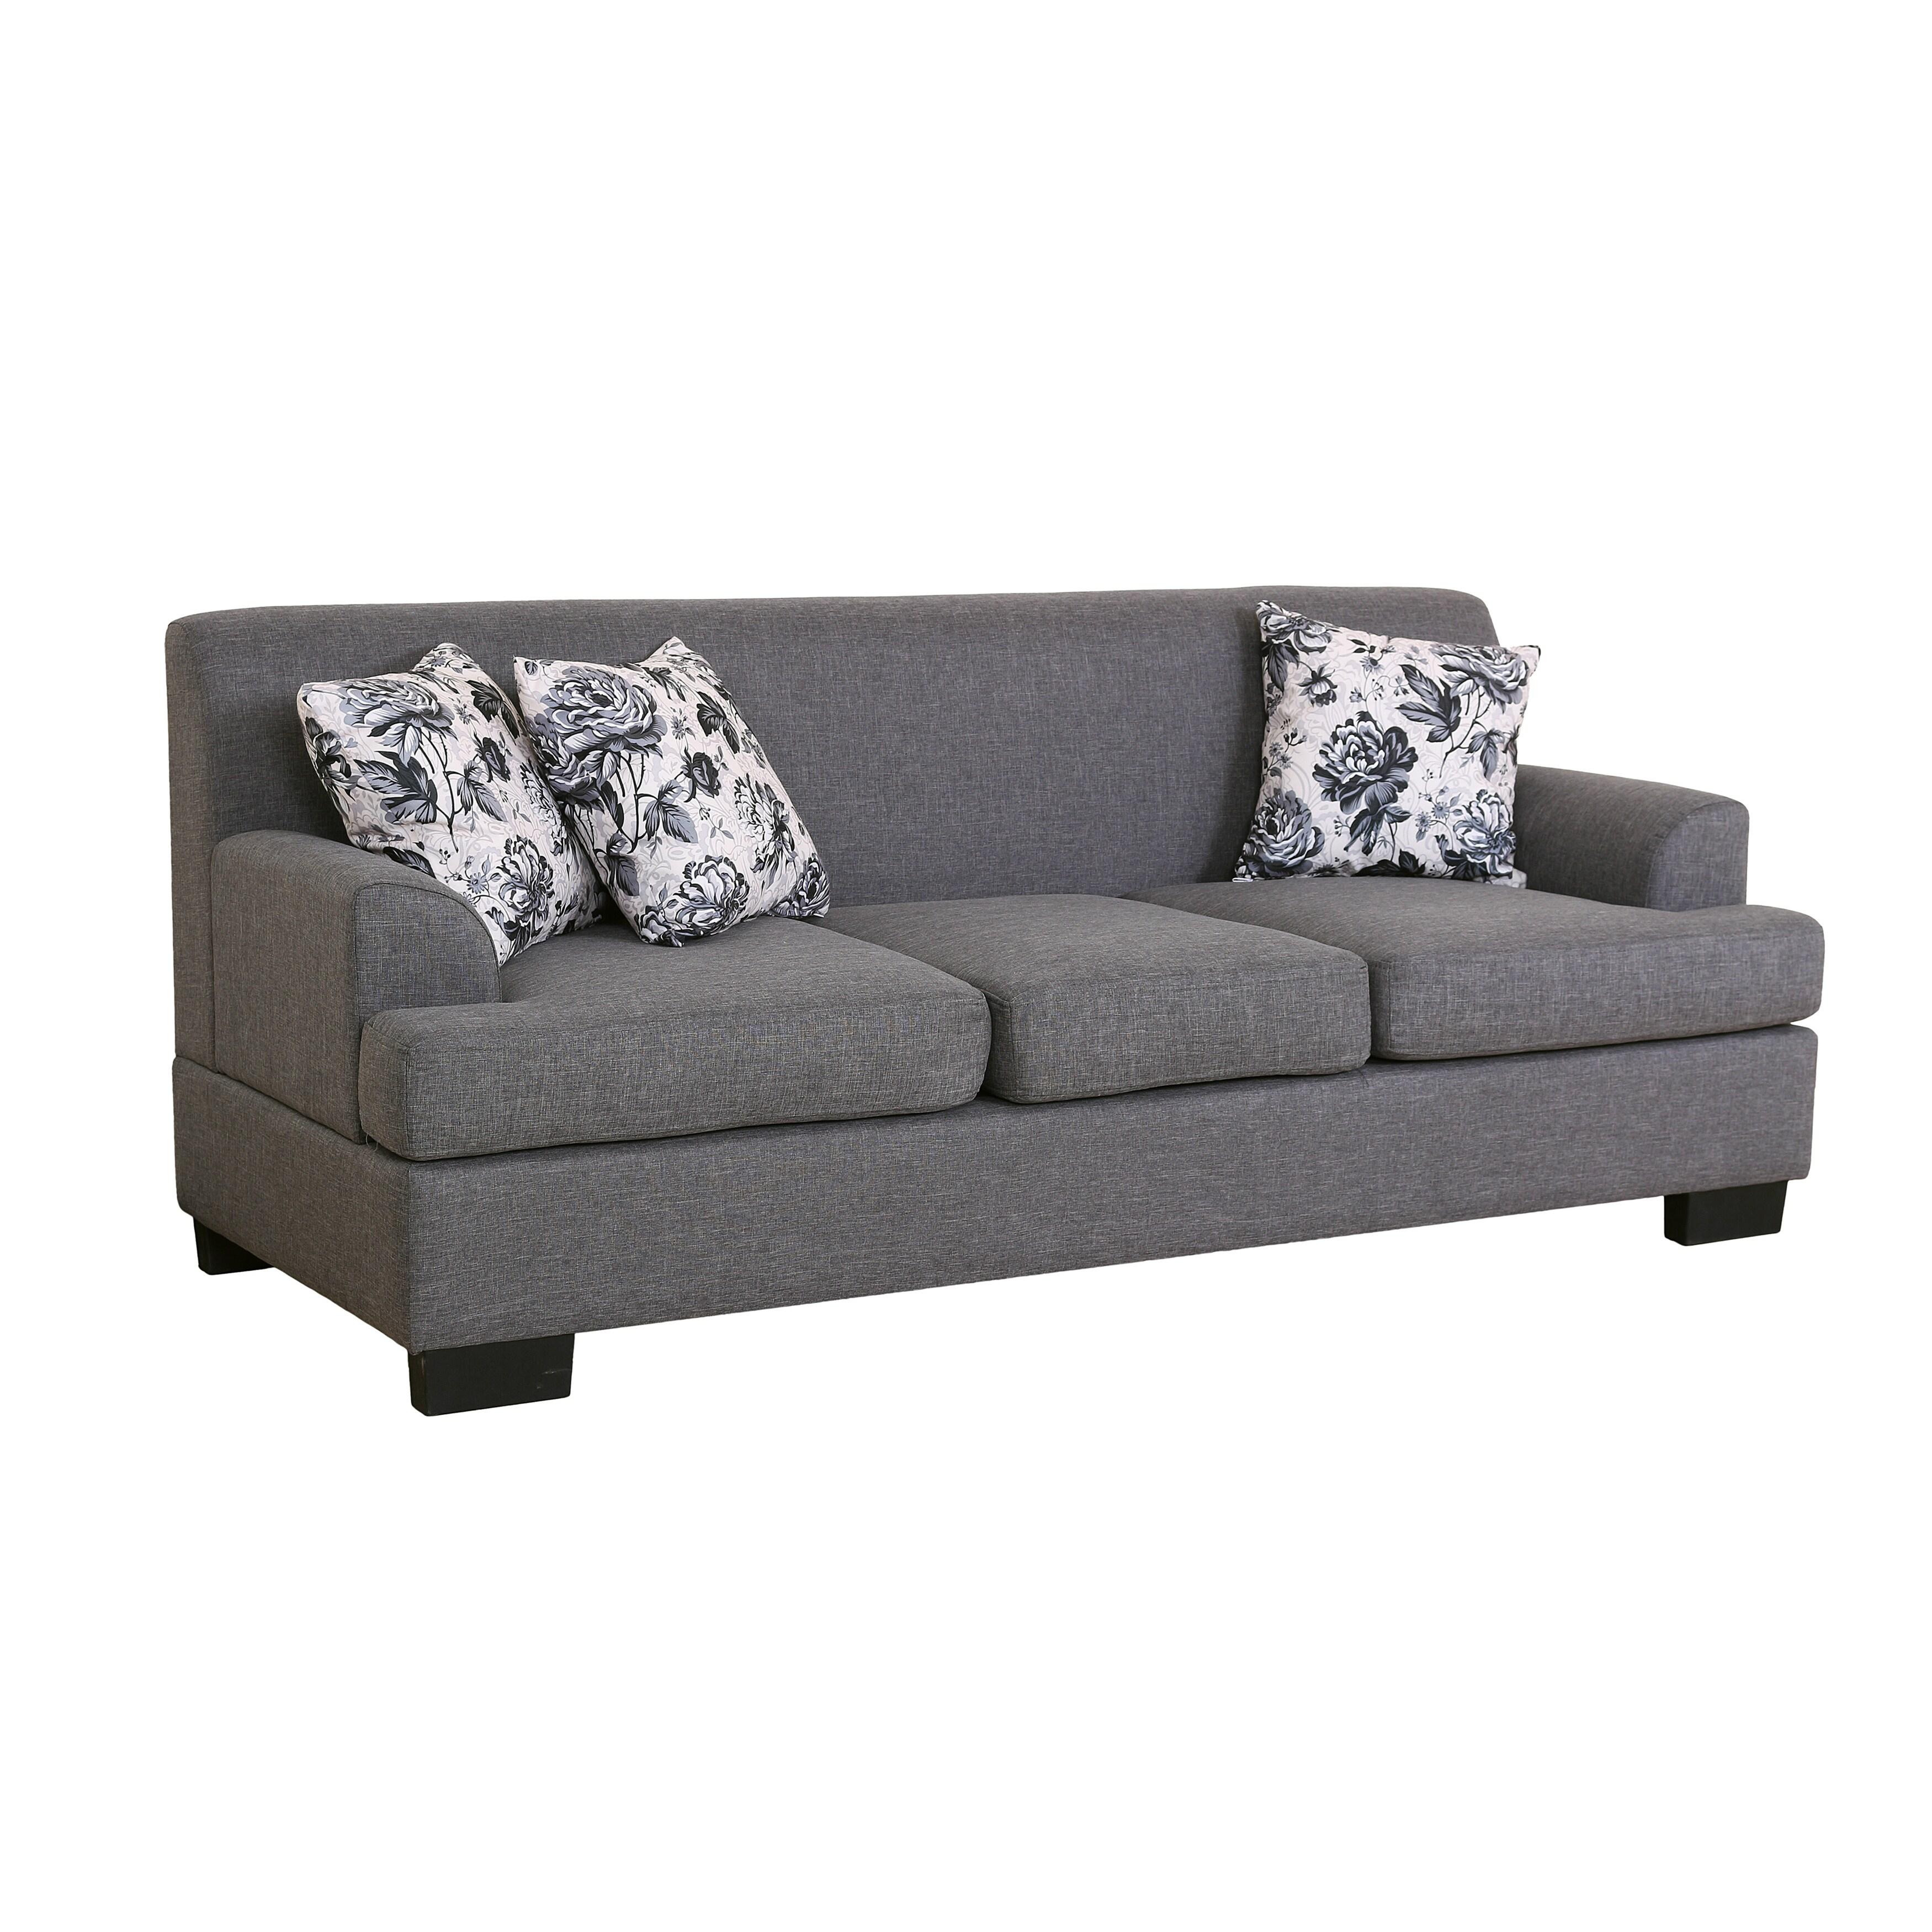 Excellent Allen Modern Fabric 2 Piece Sofa And Loveseat Set Andrewgaddart Wooden Chair Designs For Living Room Andrewgaddartcom